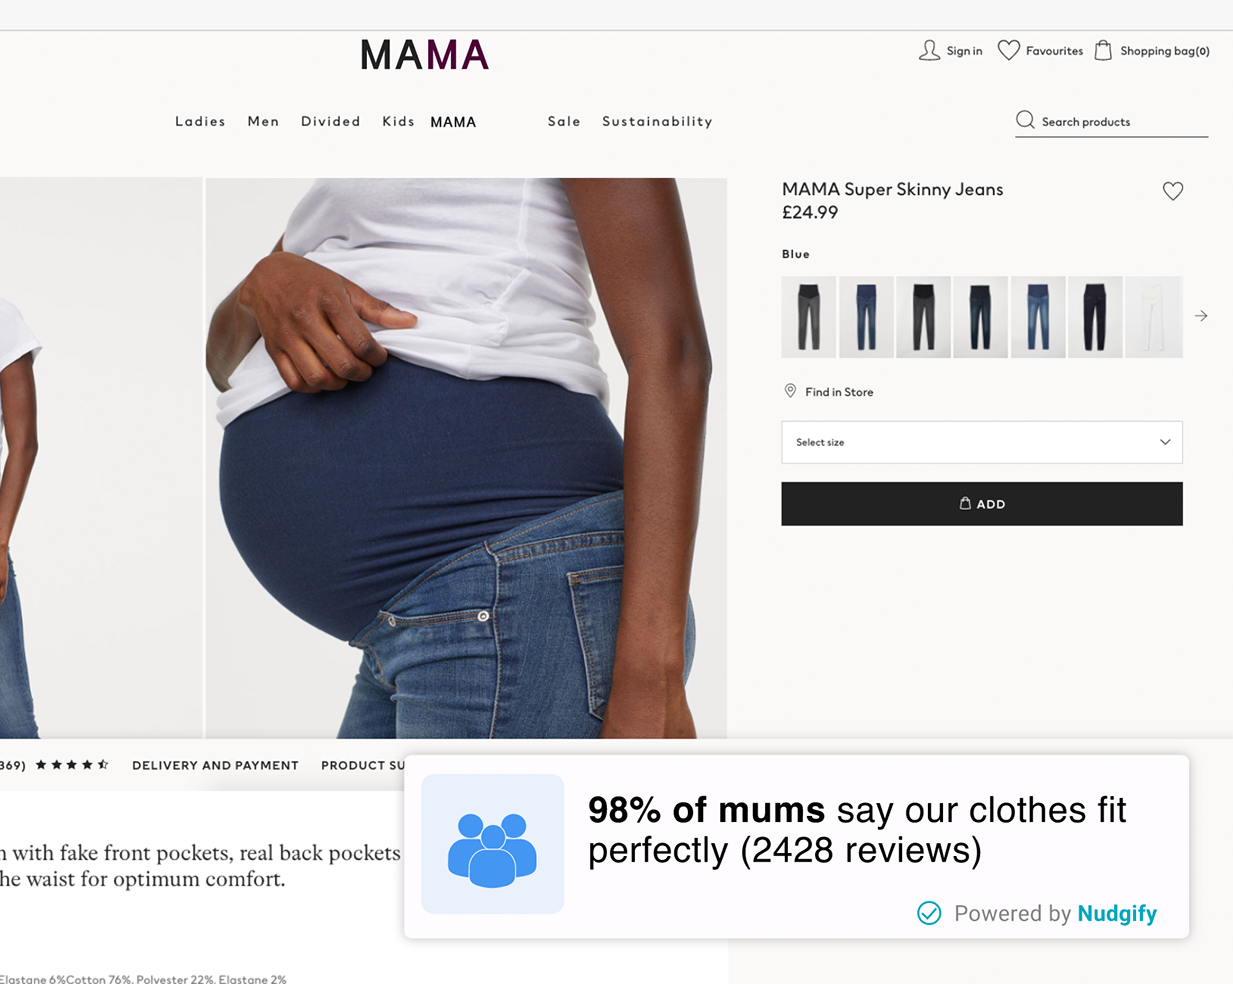 fashion ecommerce social proof